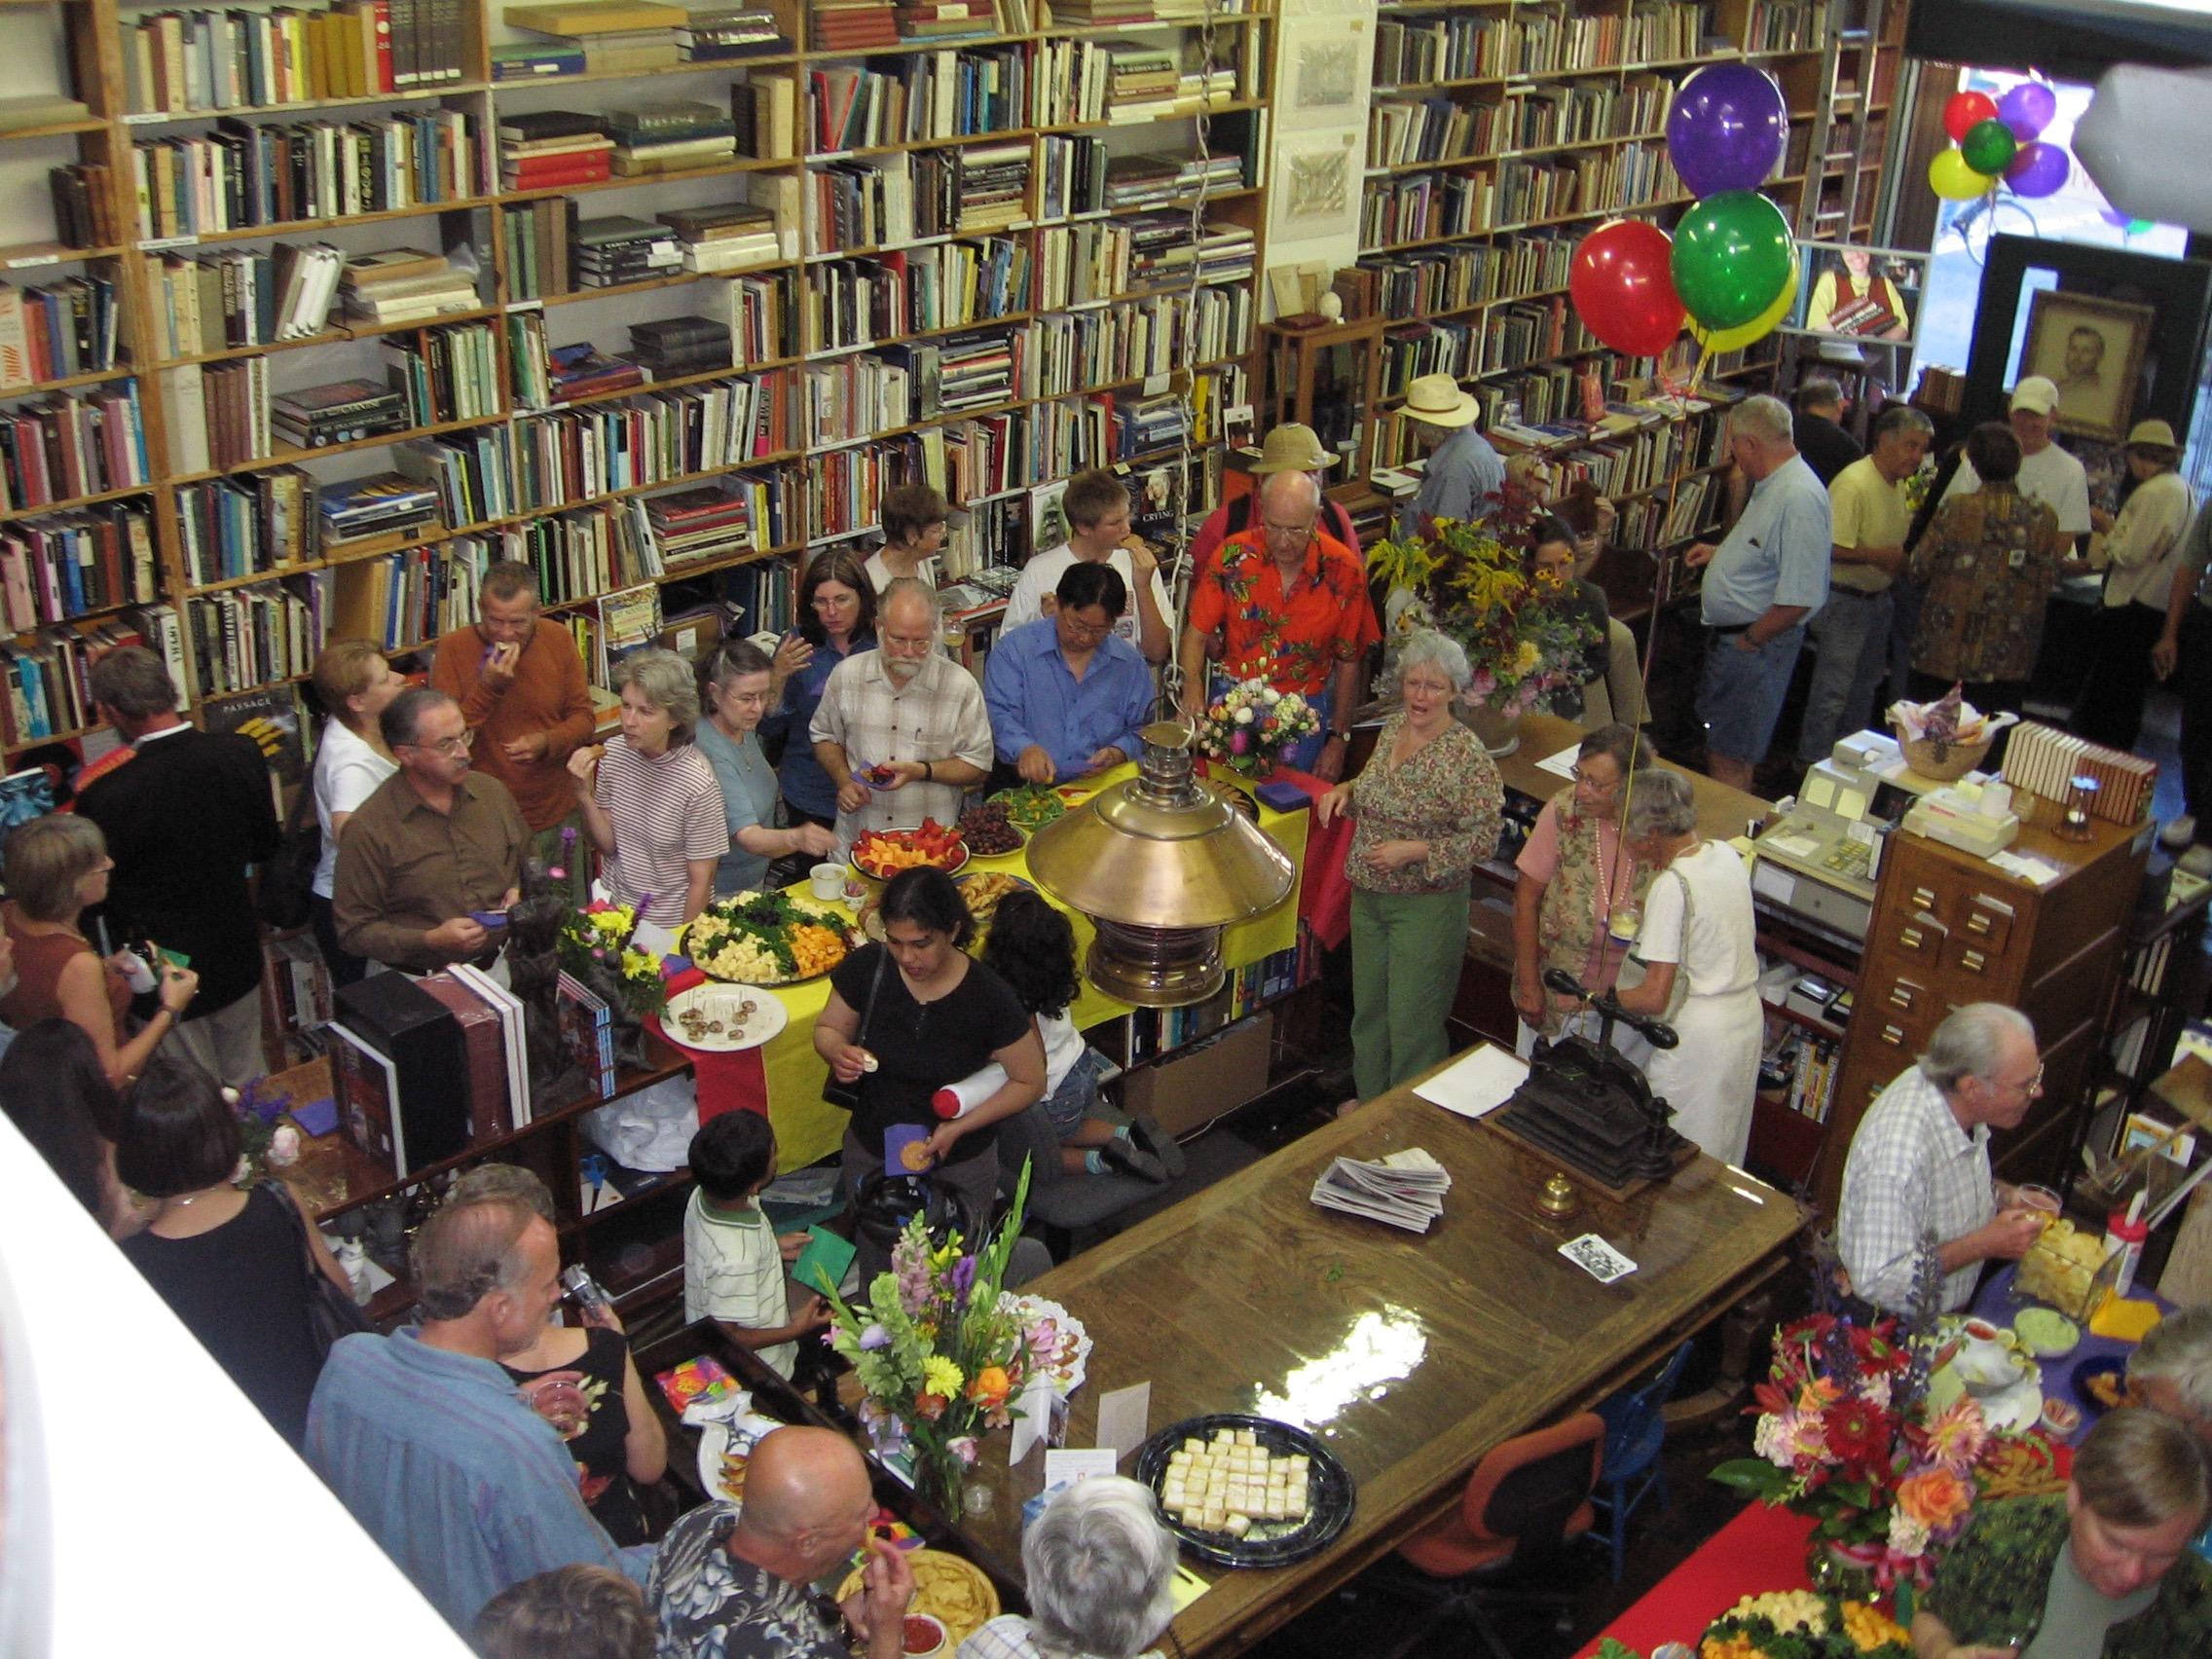 Bell's Books 75th Festivities